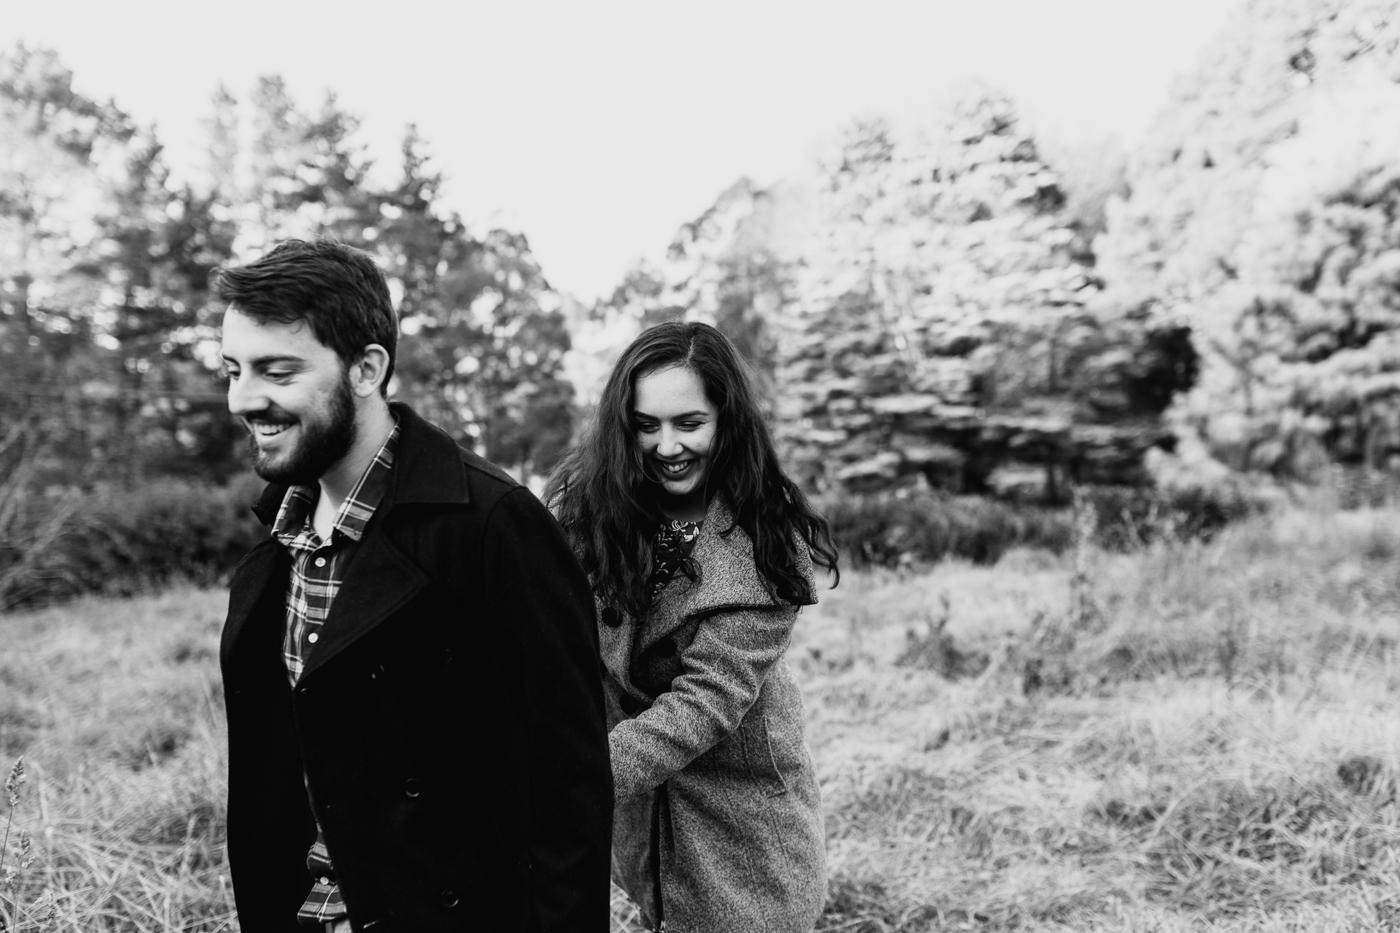 Kate & Kieran - Southern Highlands Engagement - Samantha Heather Photography-63.jpg